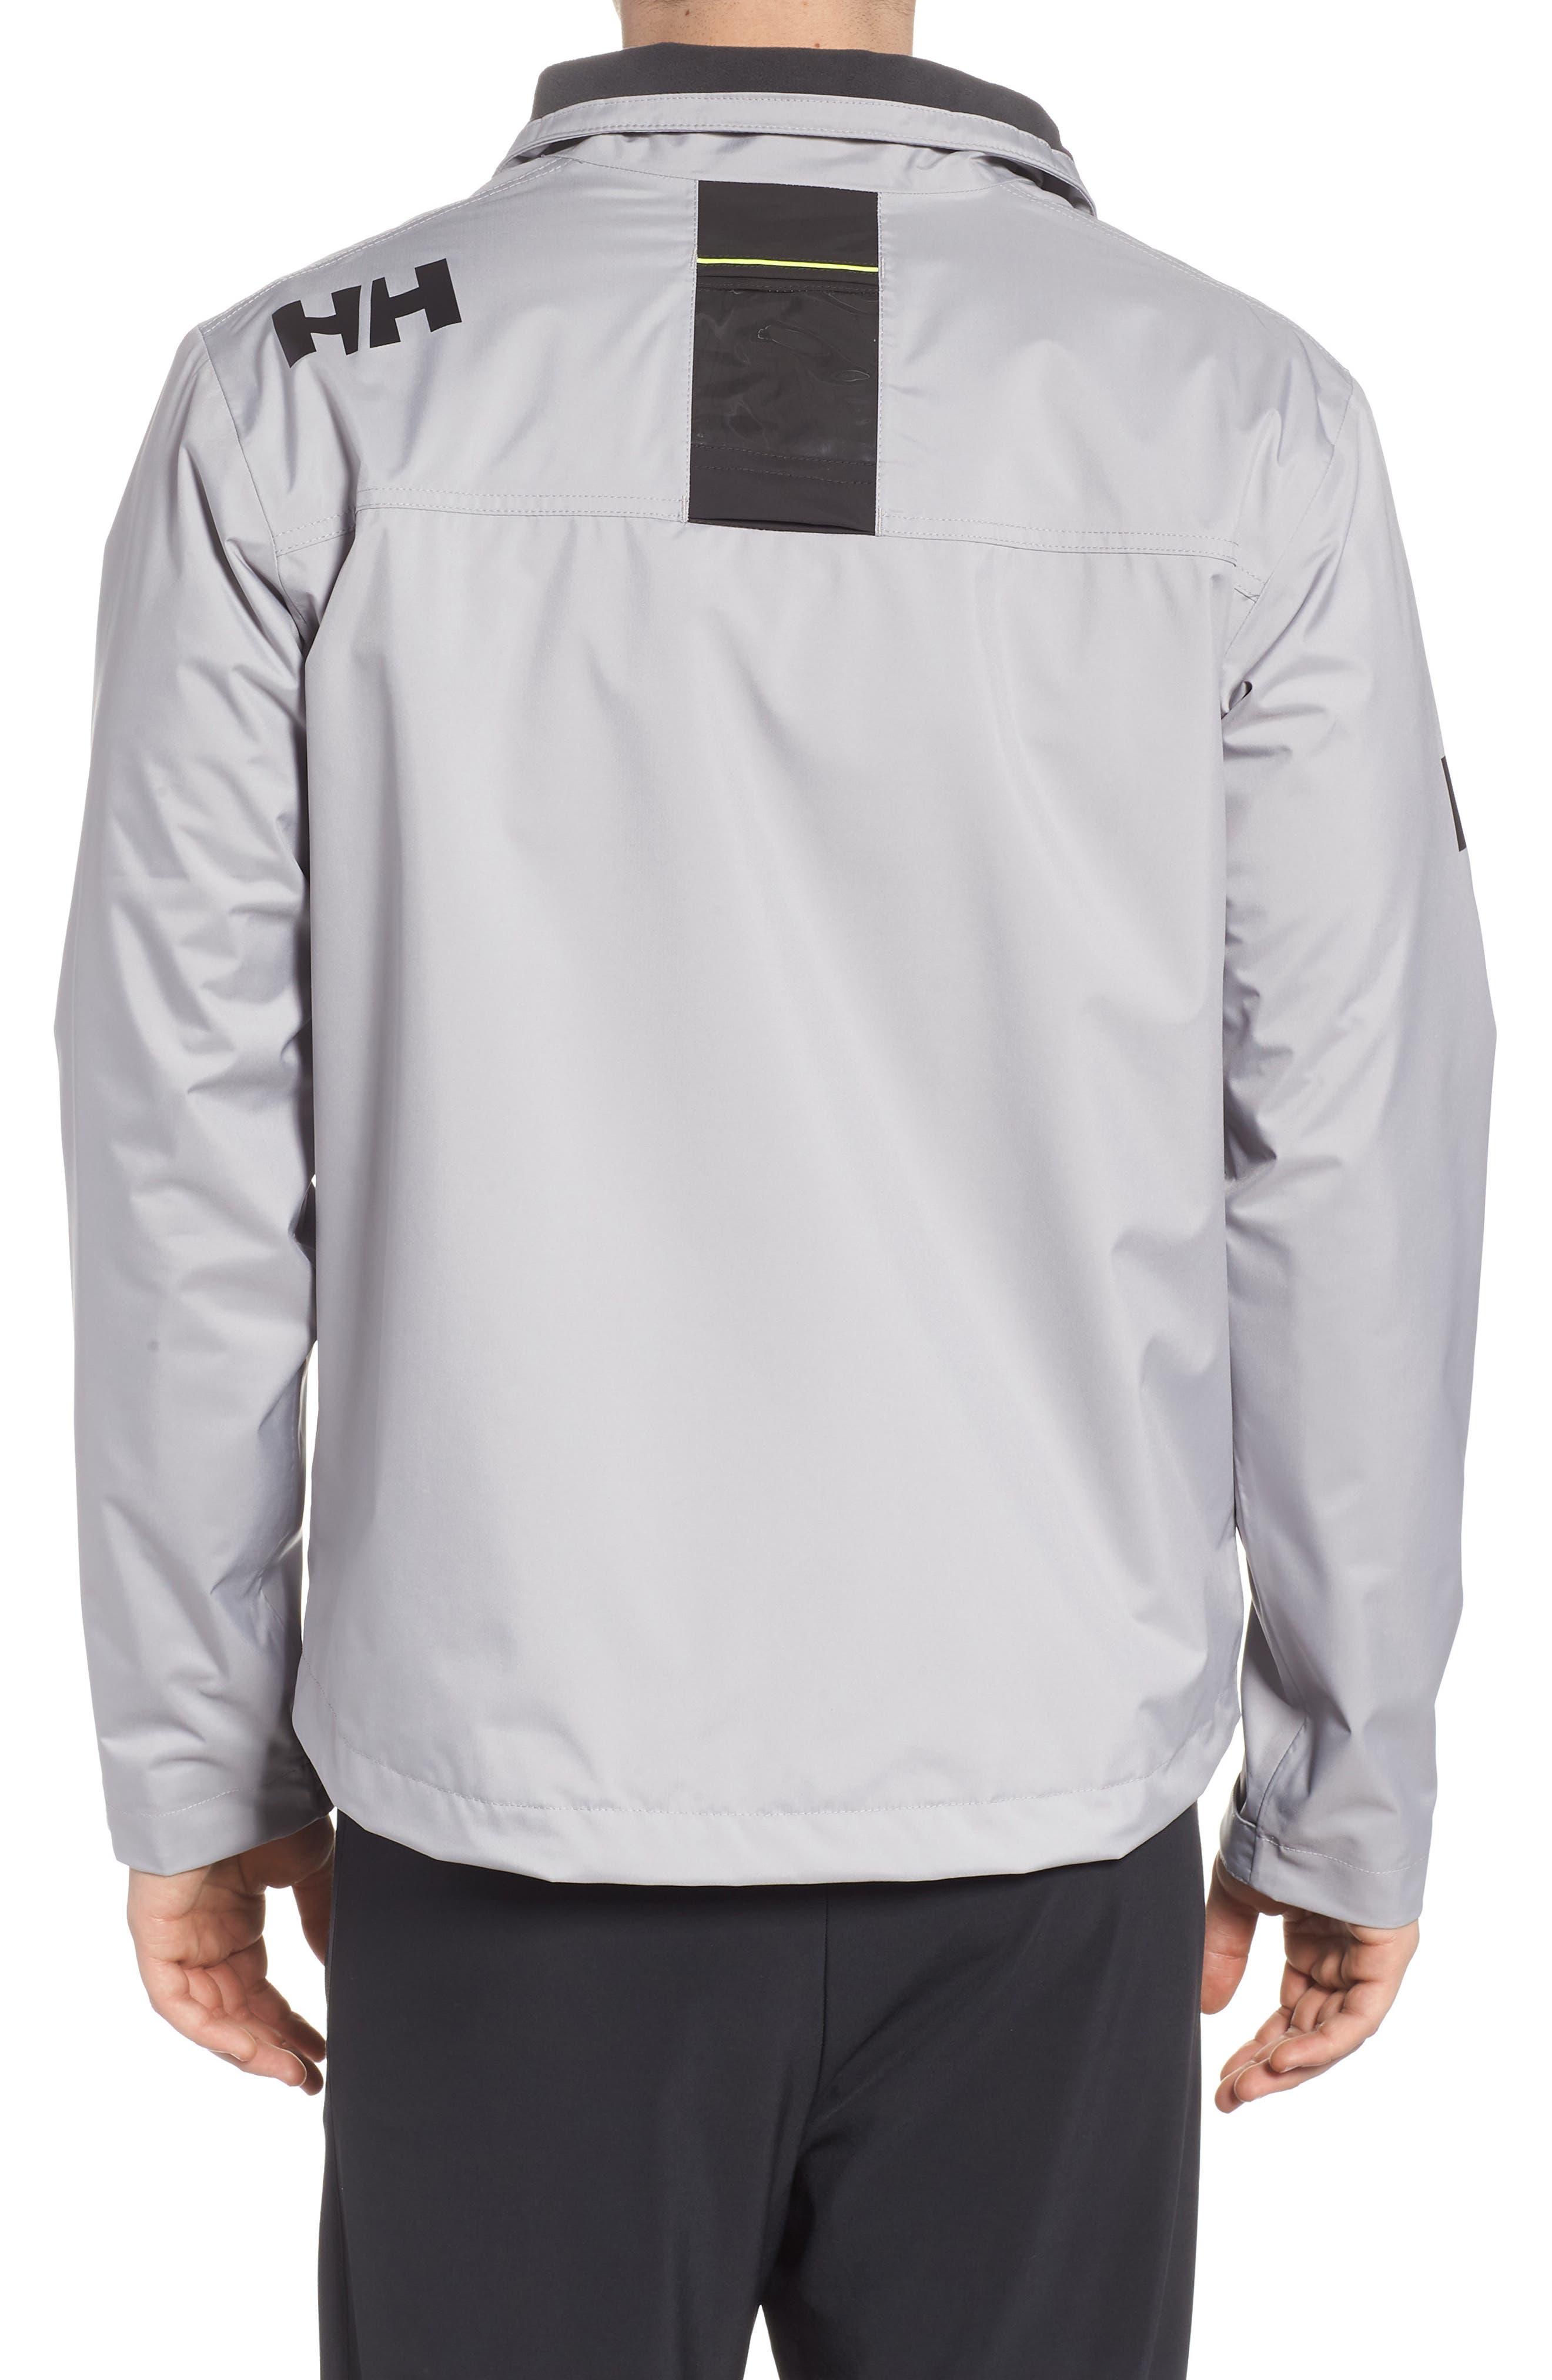 'Crew' Waterproof & Windproof Jacket,                             Alternate thumbnail 2, color,                             024